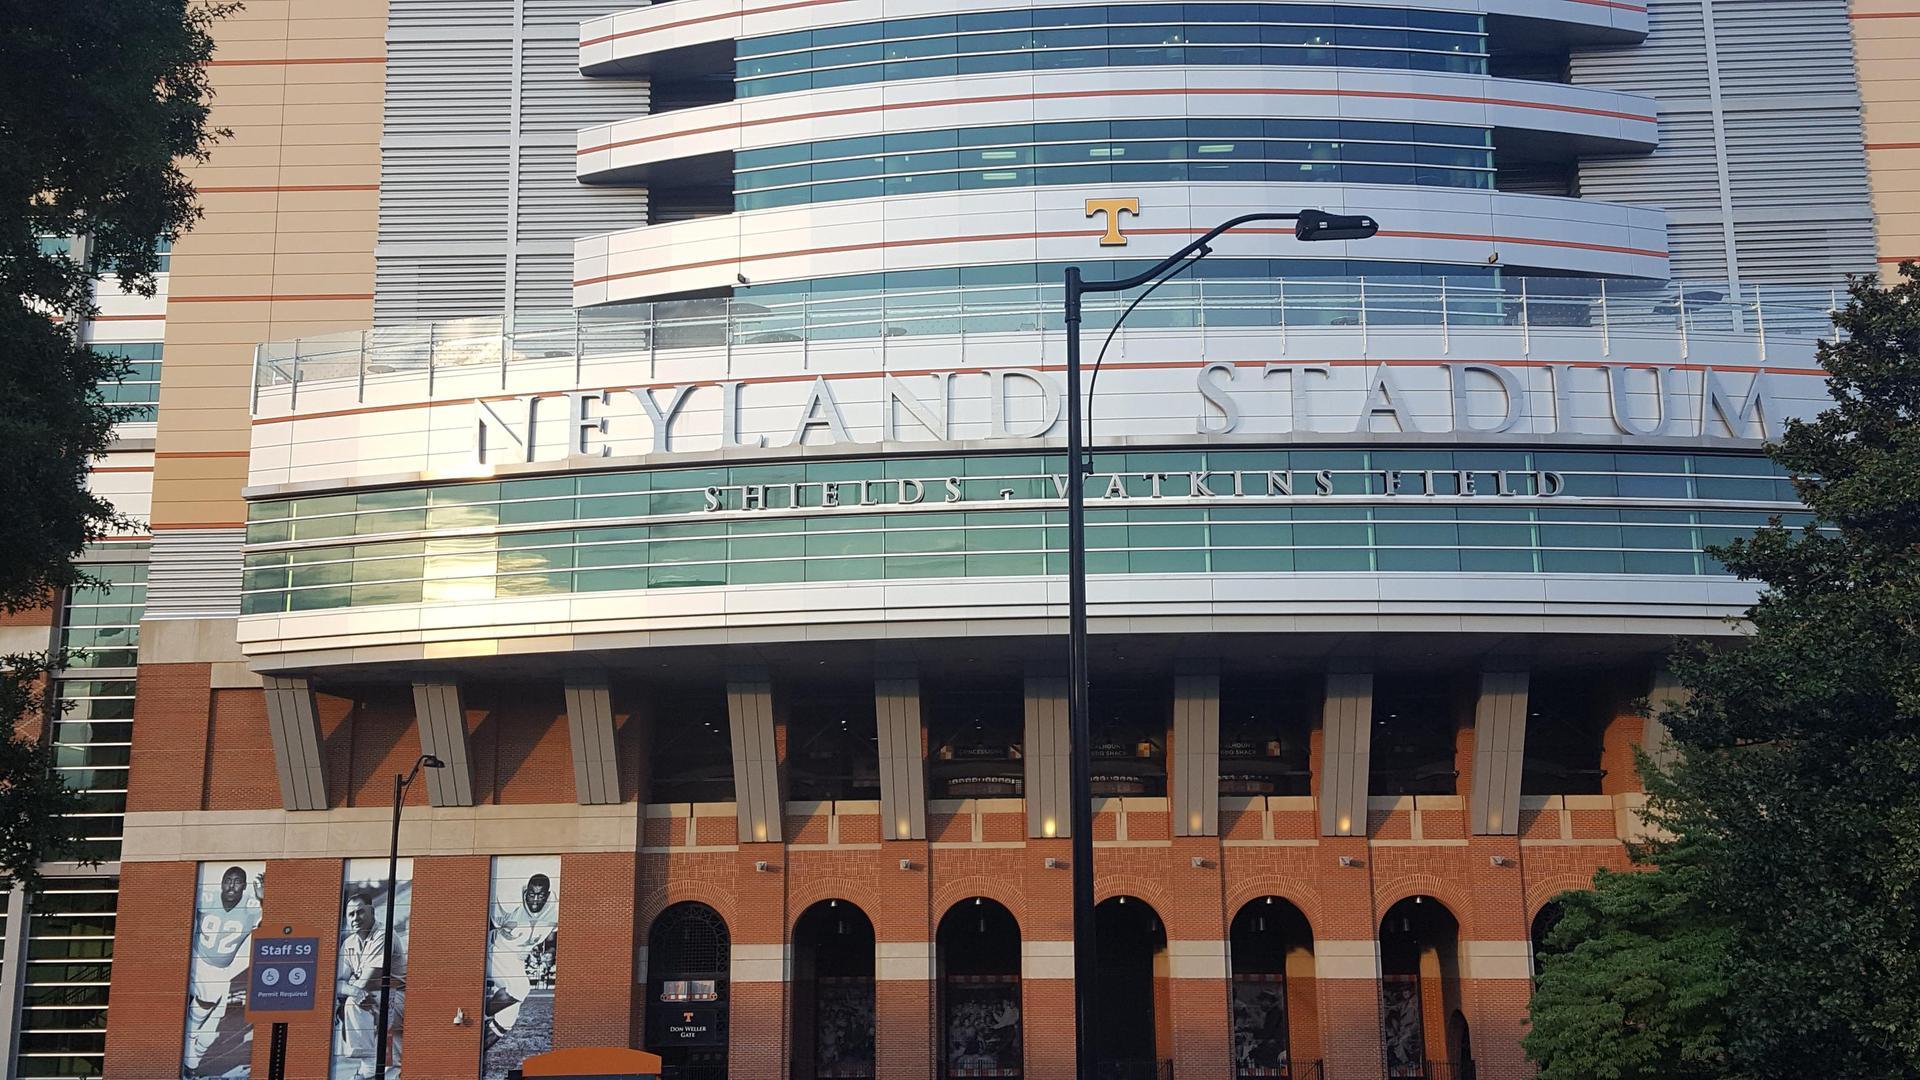 Neyland Stadium - University of Tennessee (Knoxville)